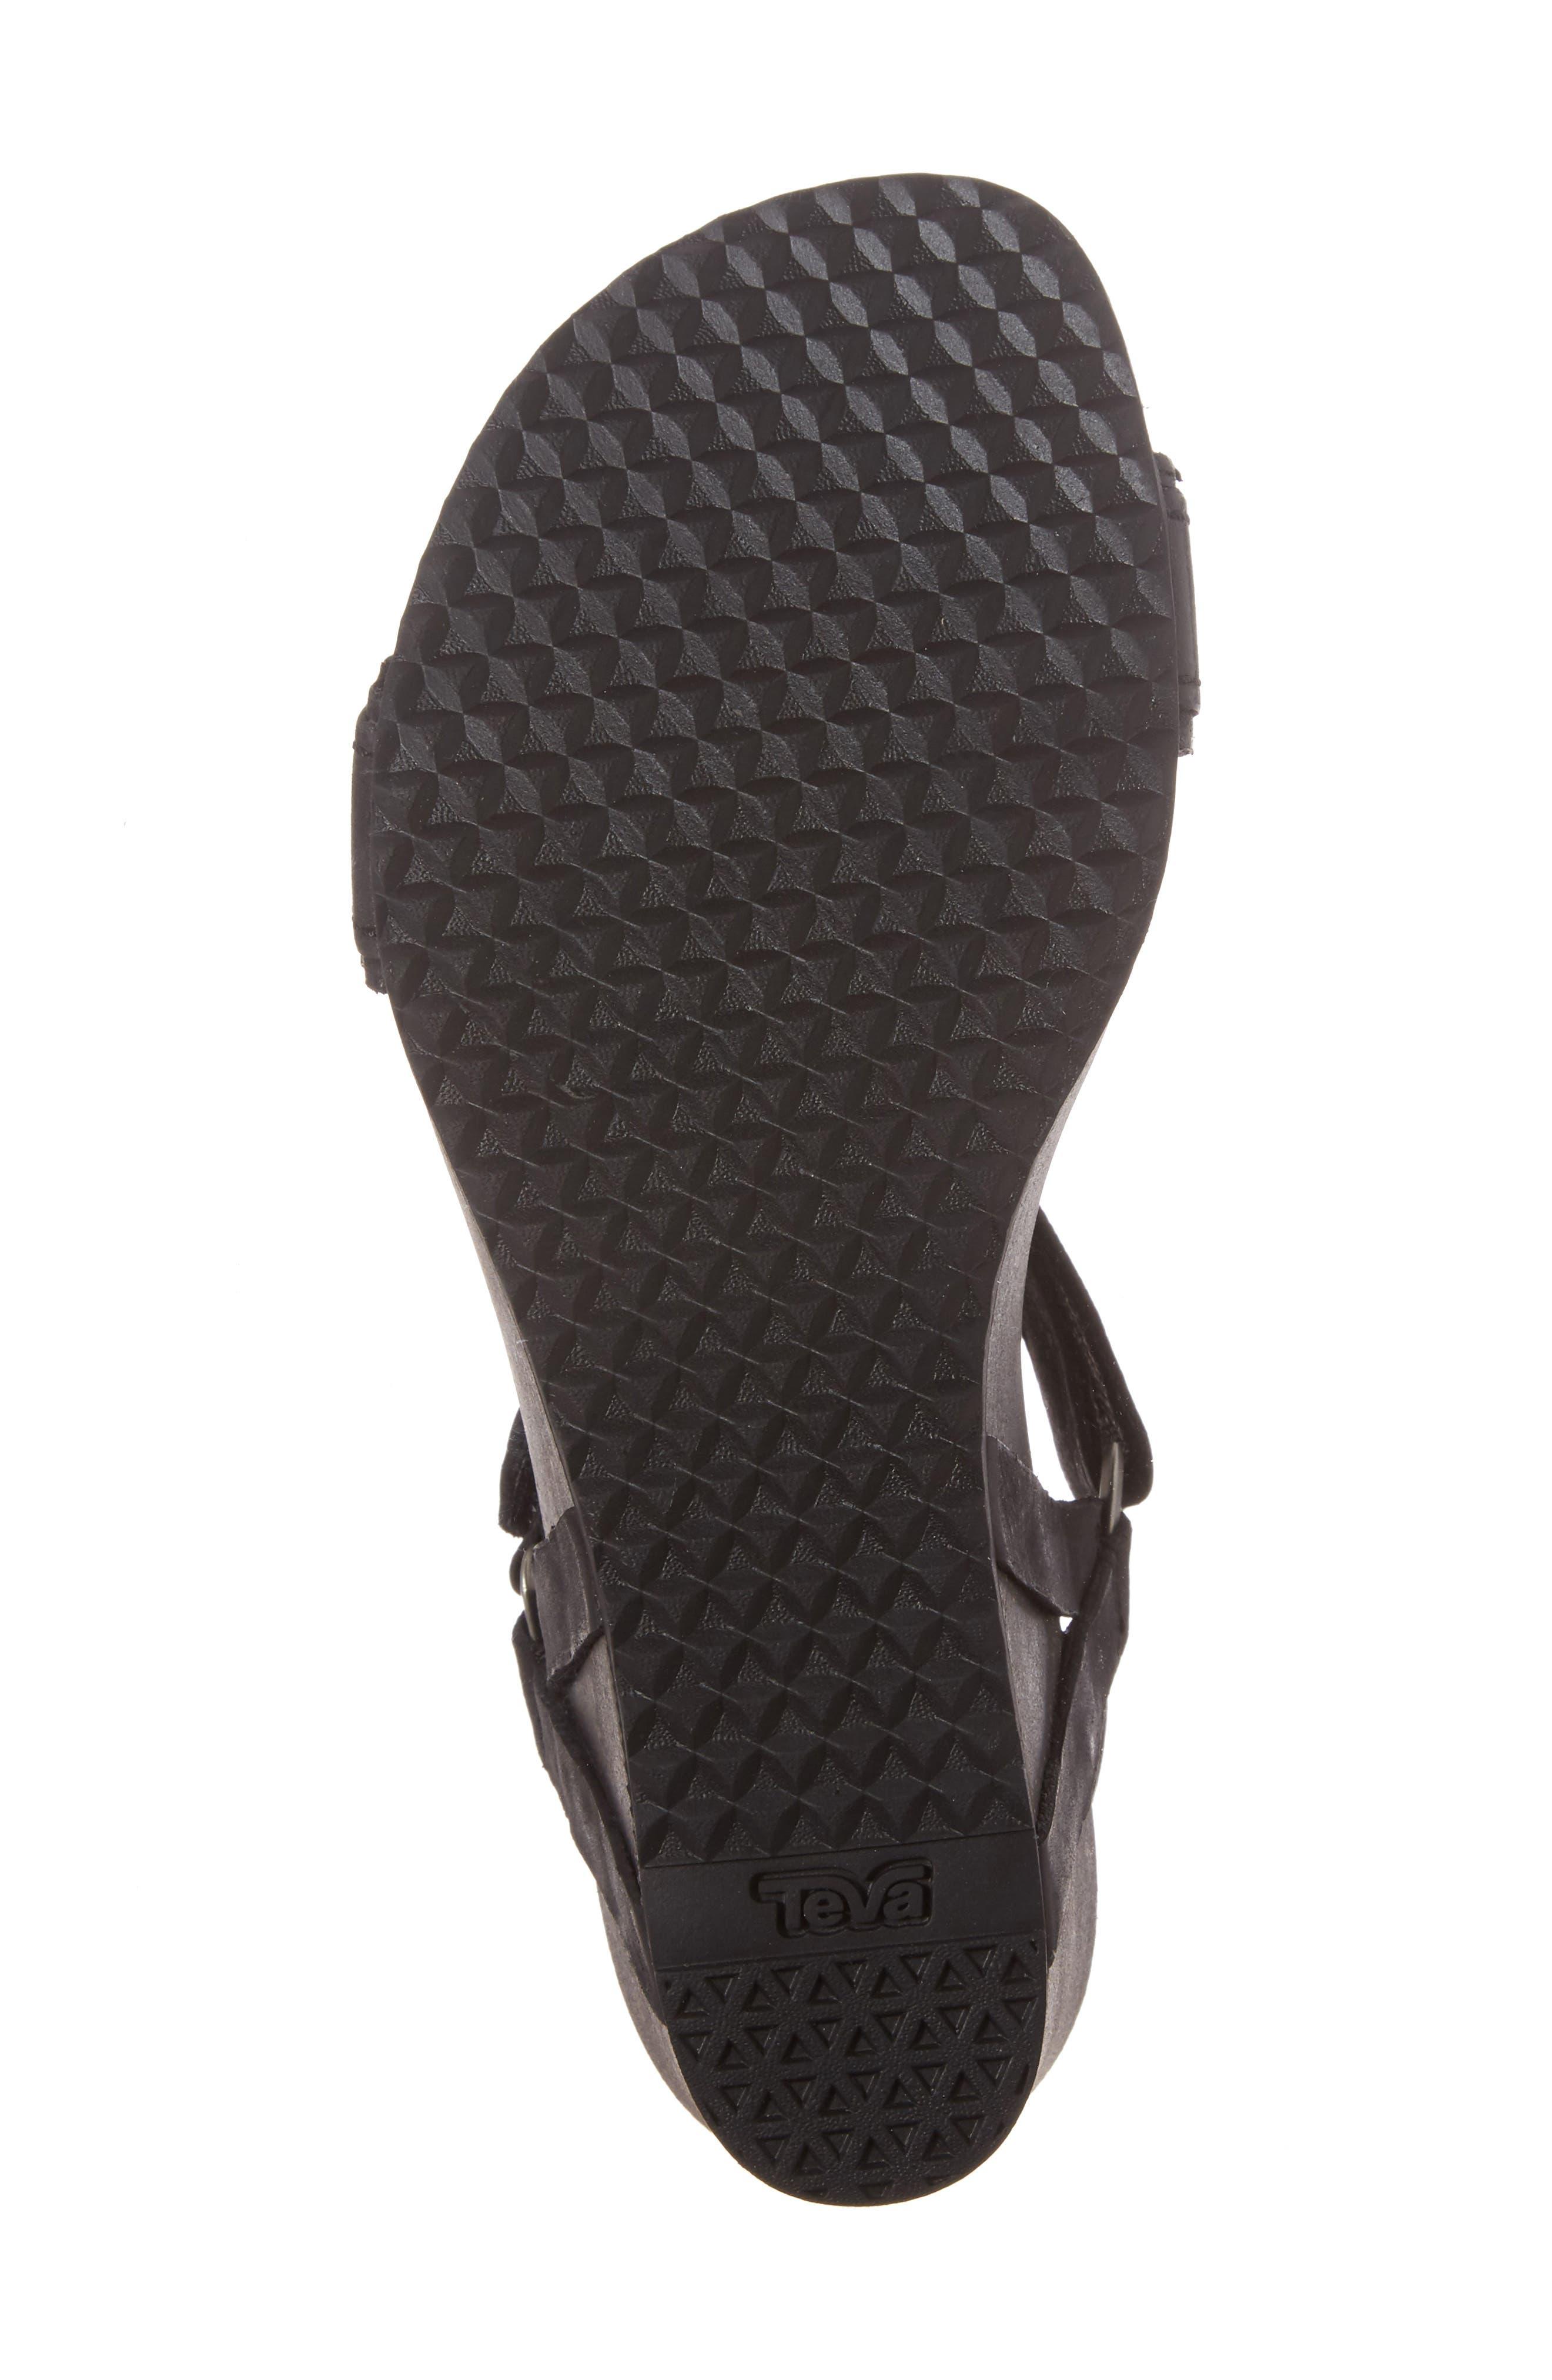 TEVA, Ysidro Stitch Wedge Sandal, Alternate thumbnail 6, color, 001